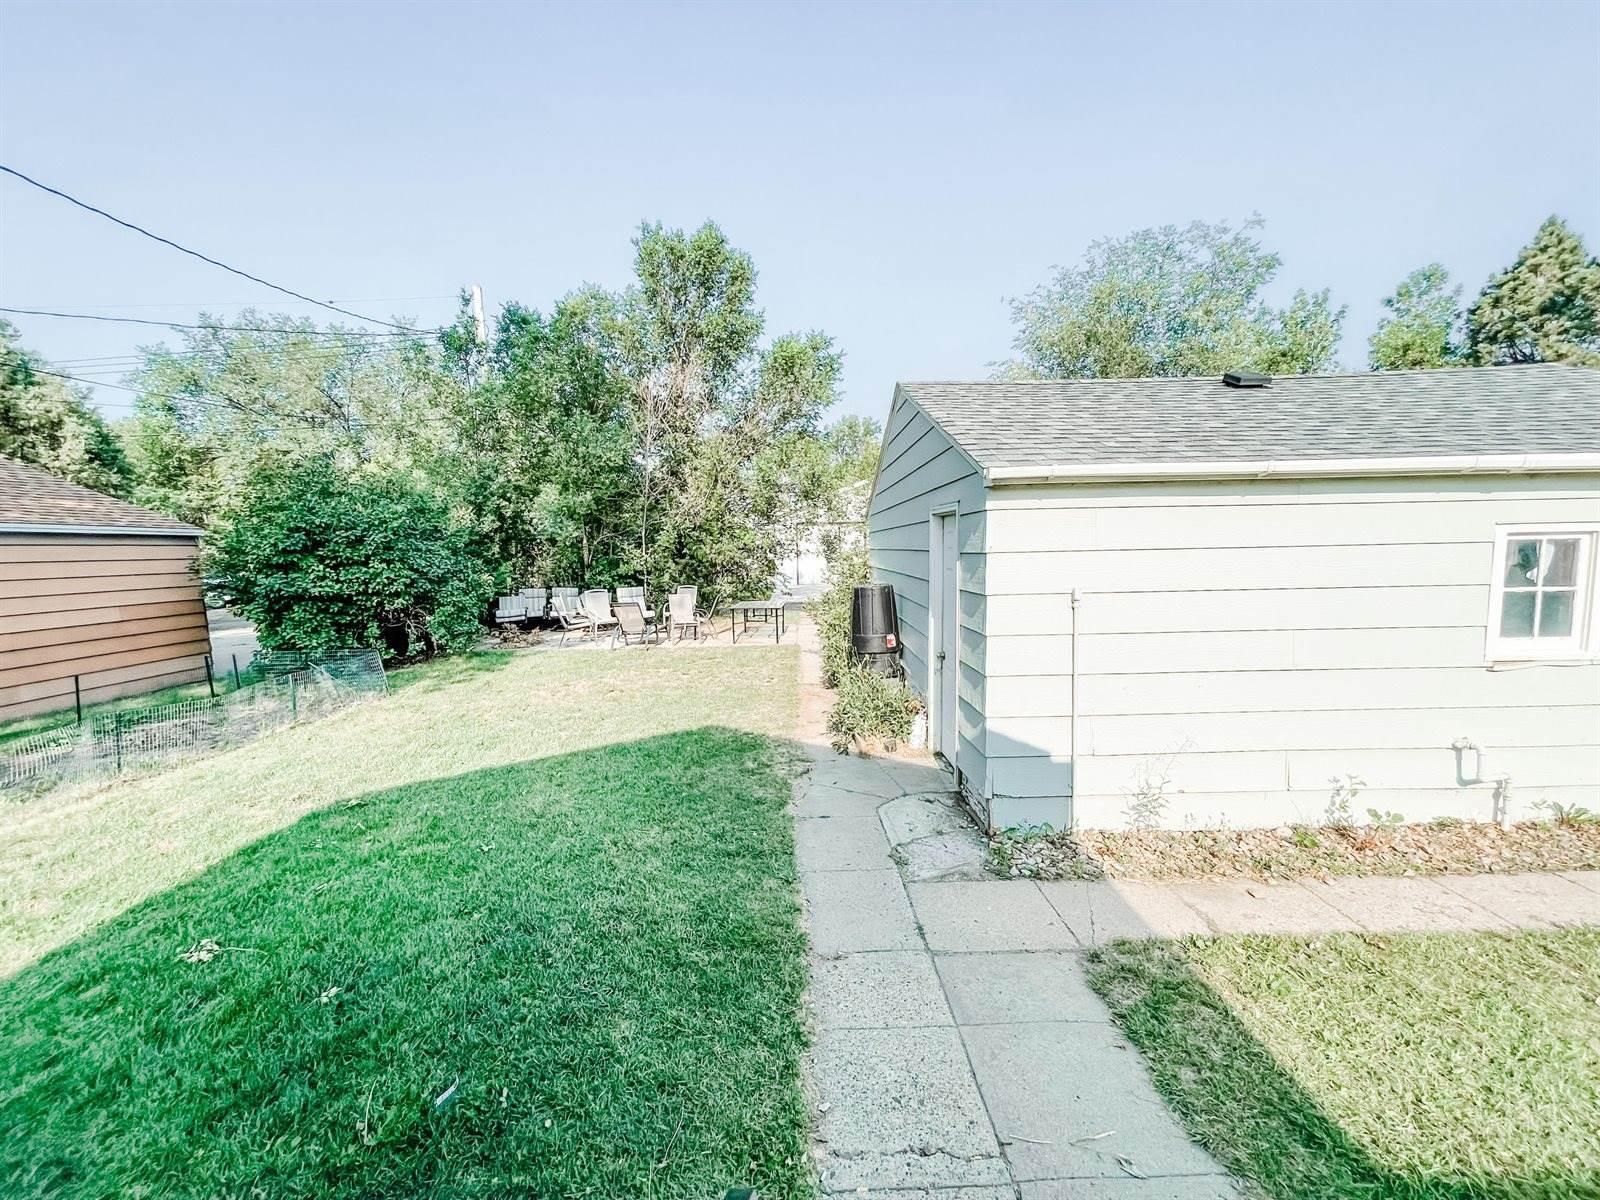 527 11th Ave West, Williston, ND 58801